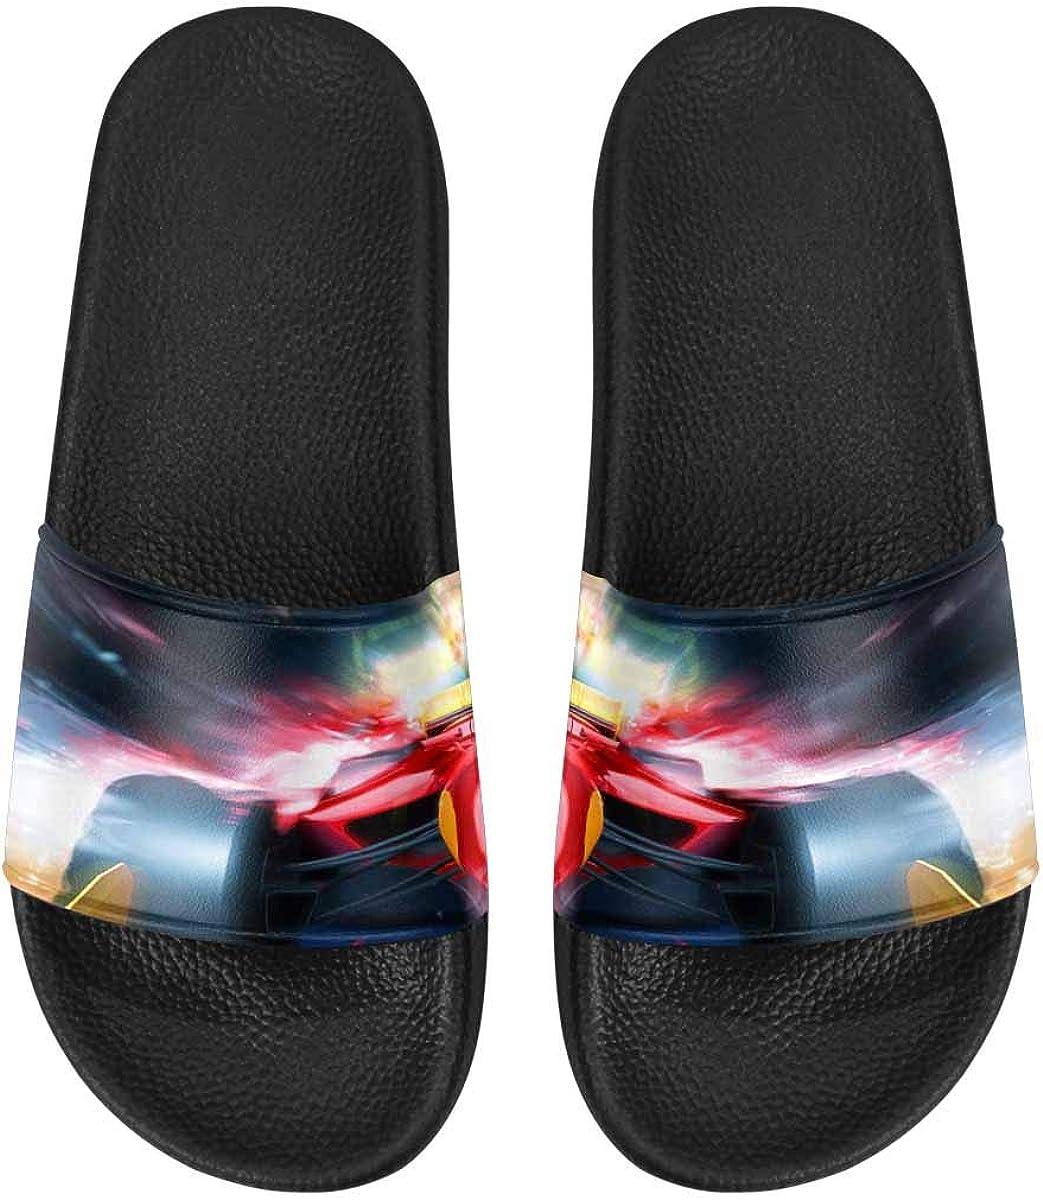 InterestPrint Slide Sandals for Women to Beach or Poor Purple Starfish